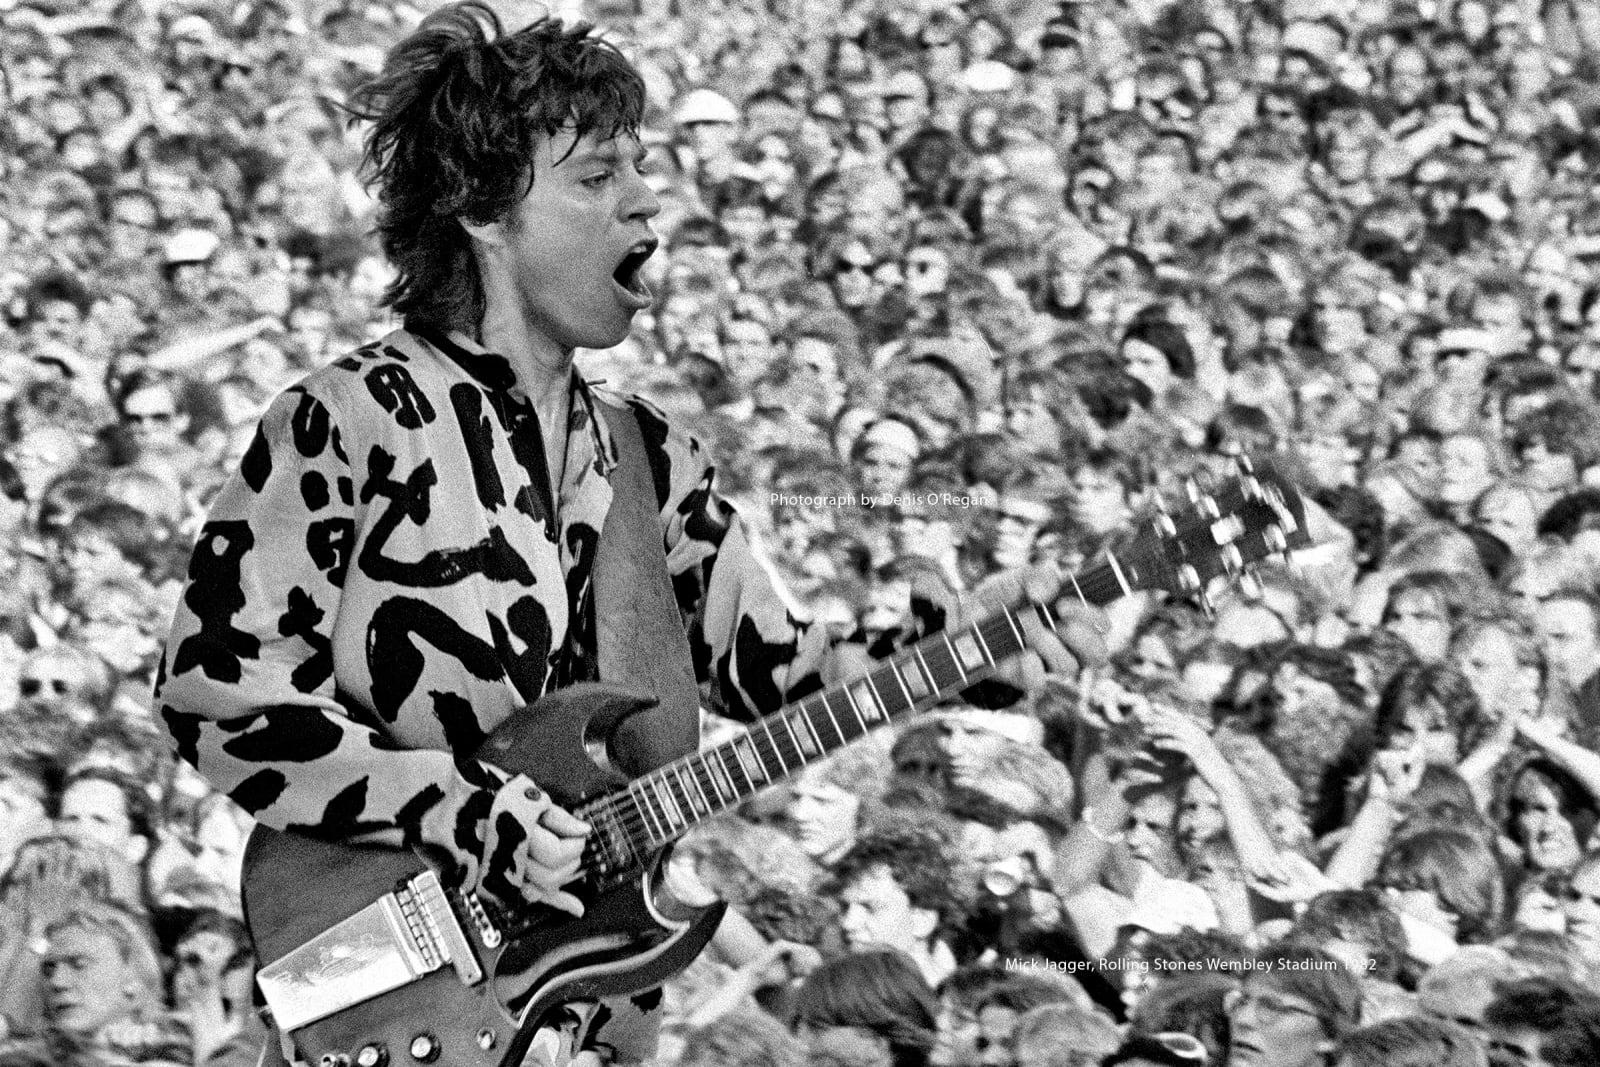 ROLLING STONES, Mick Jagger Wembley Stadium, 1982